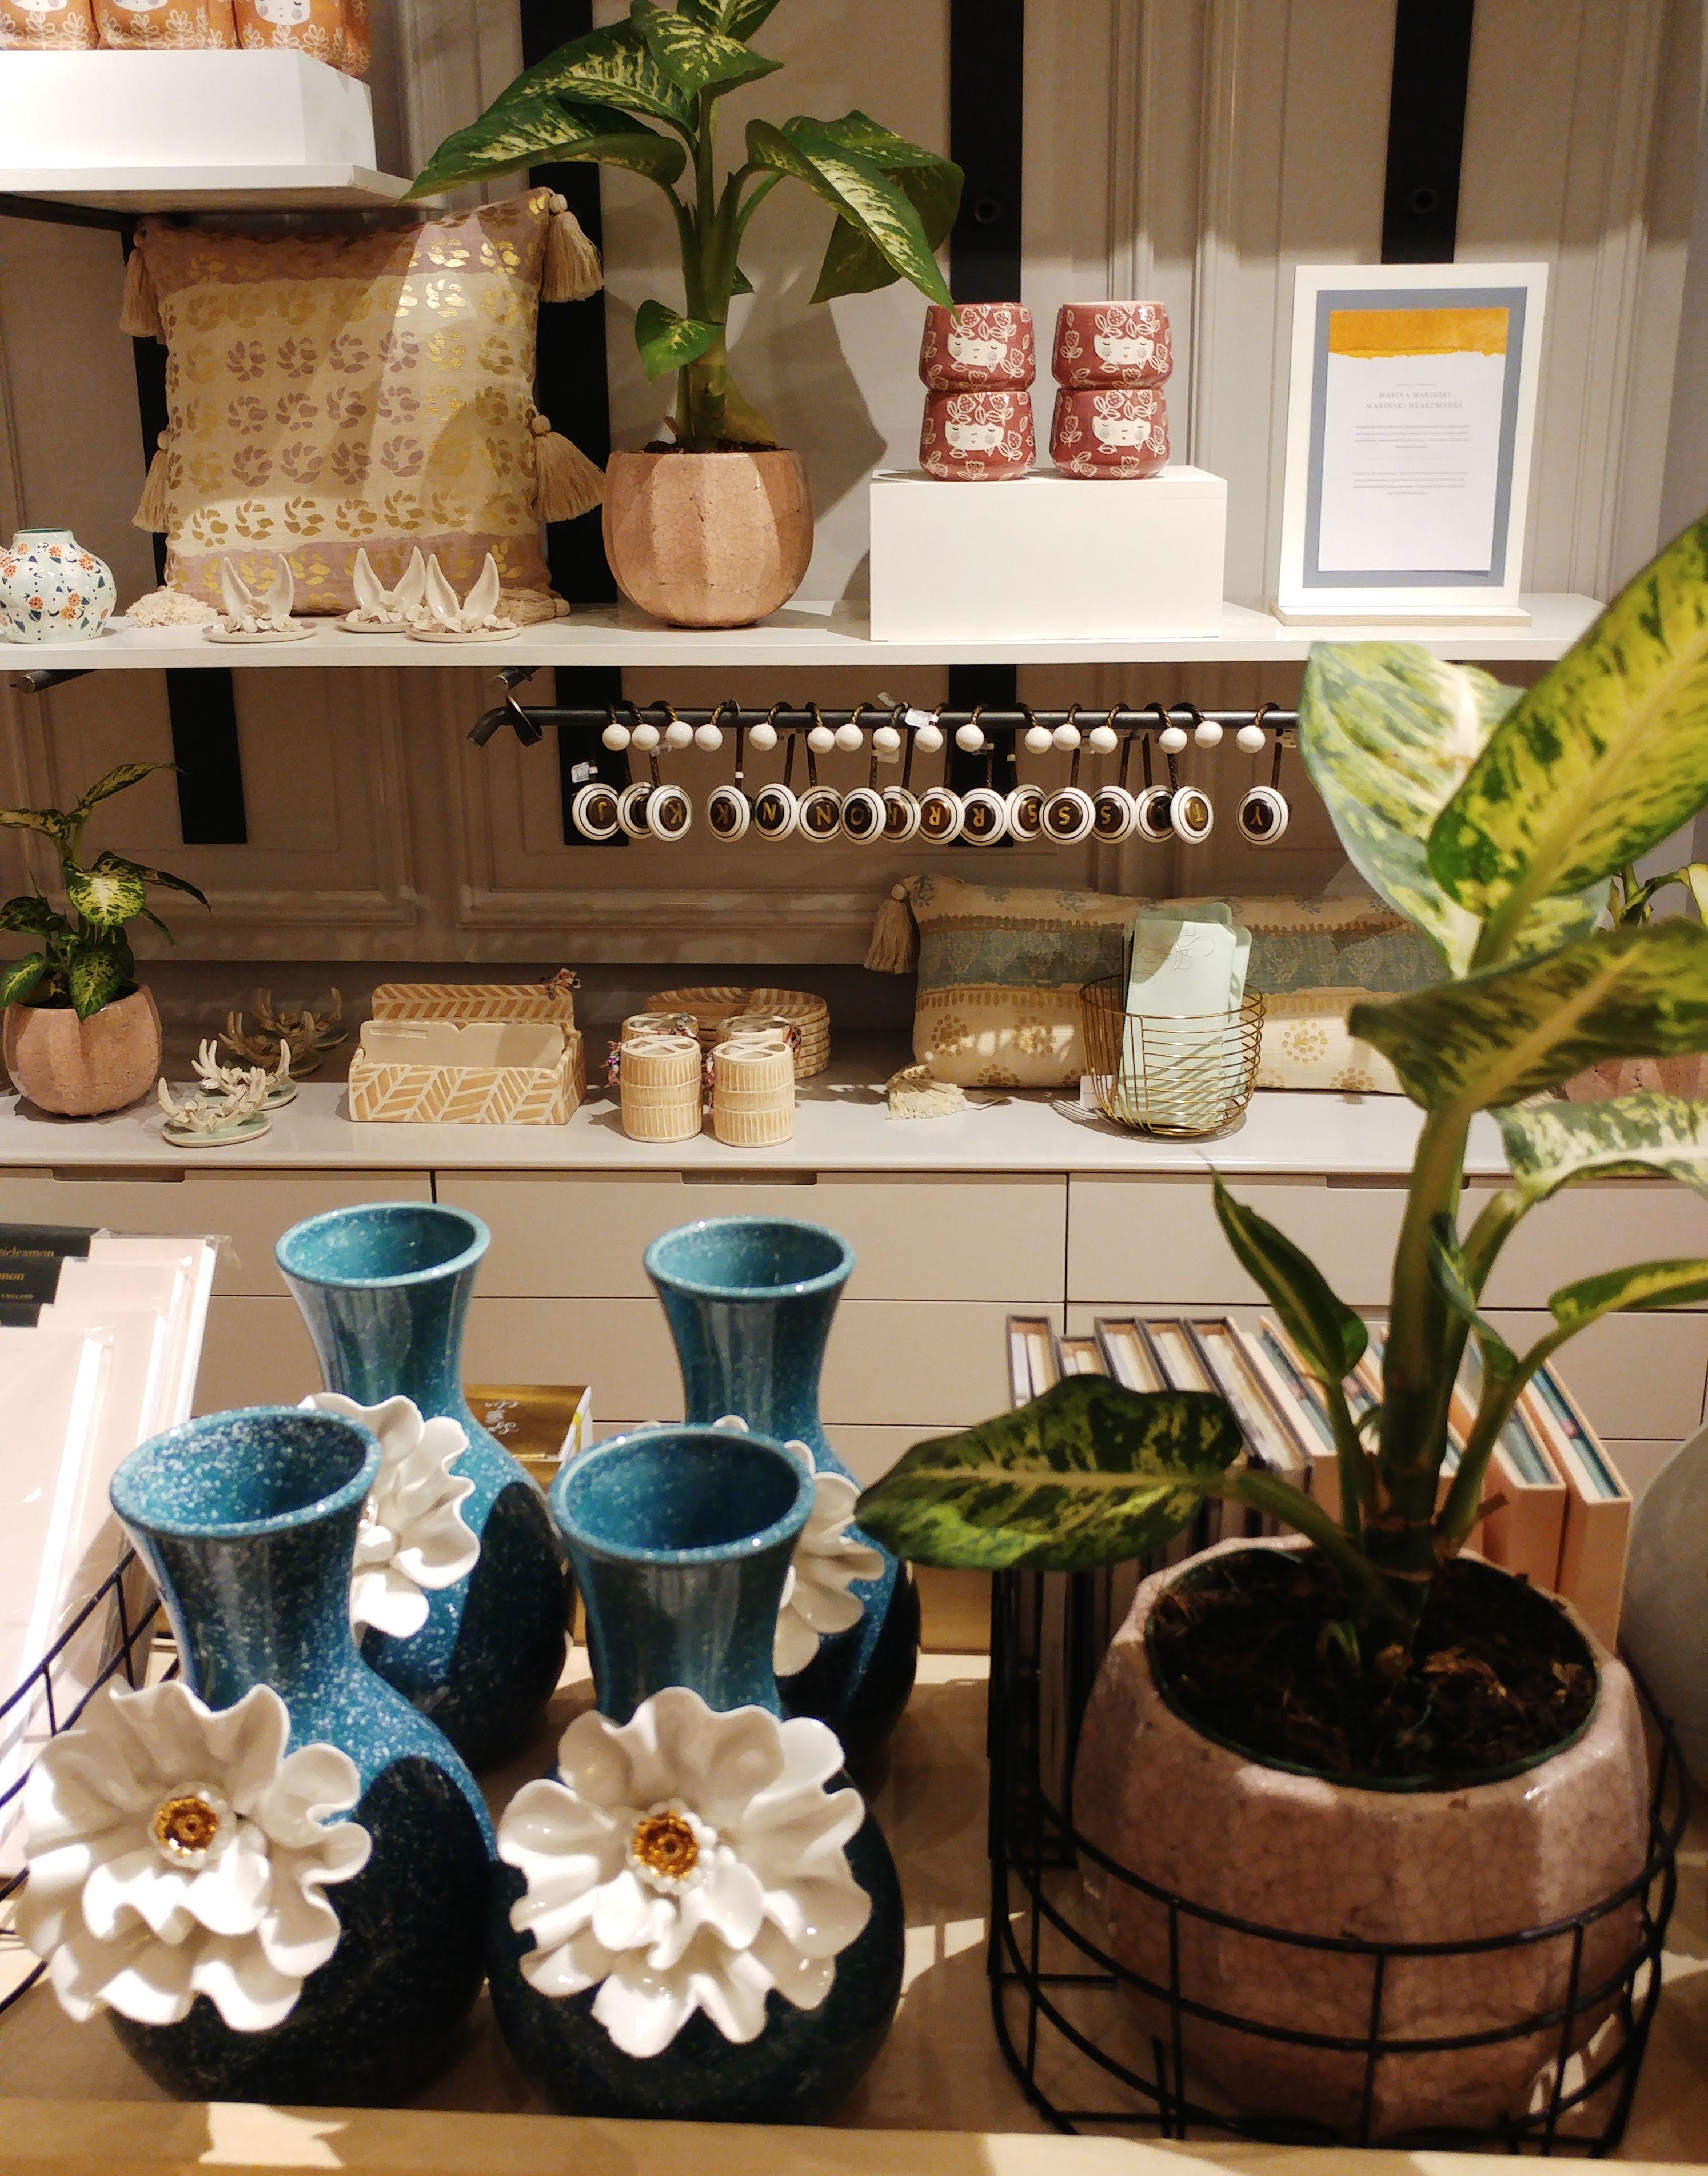 Anthropologie shop in Barcelona - ceramics